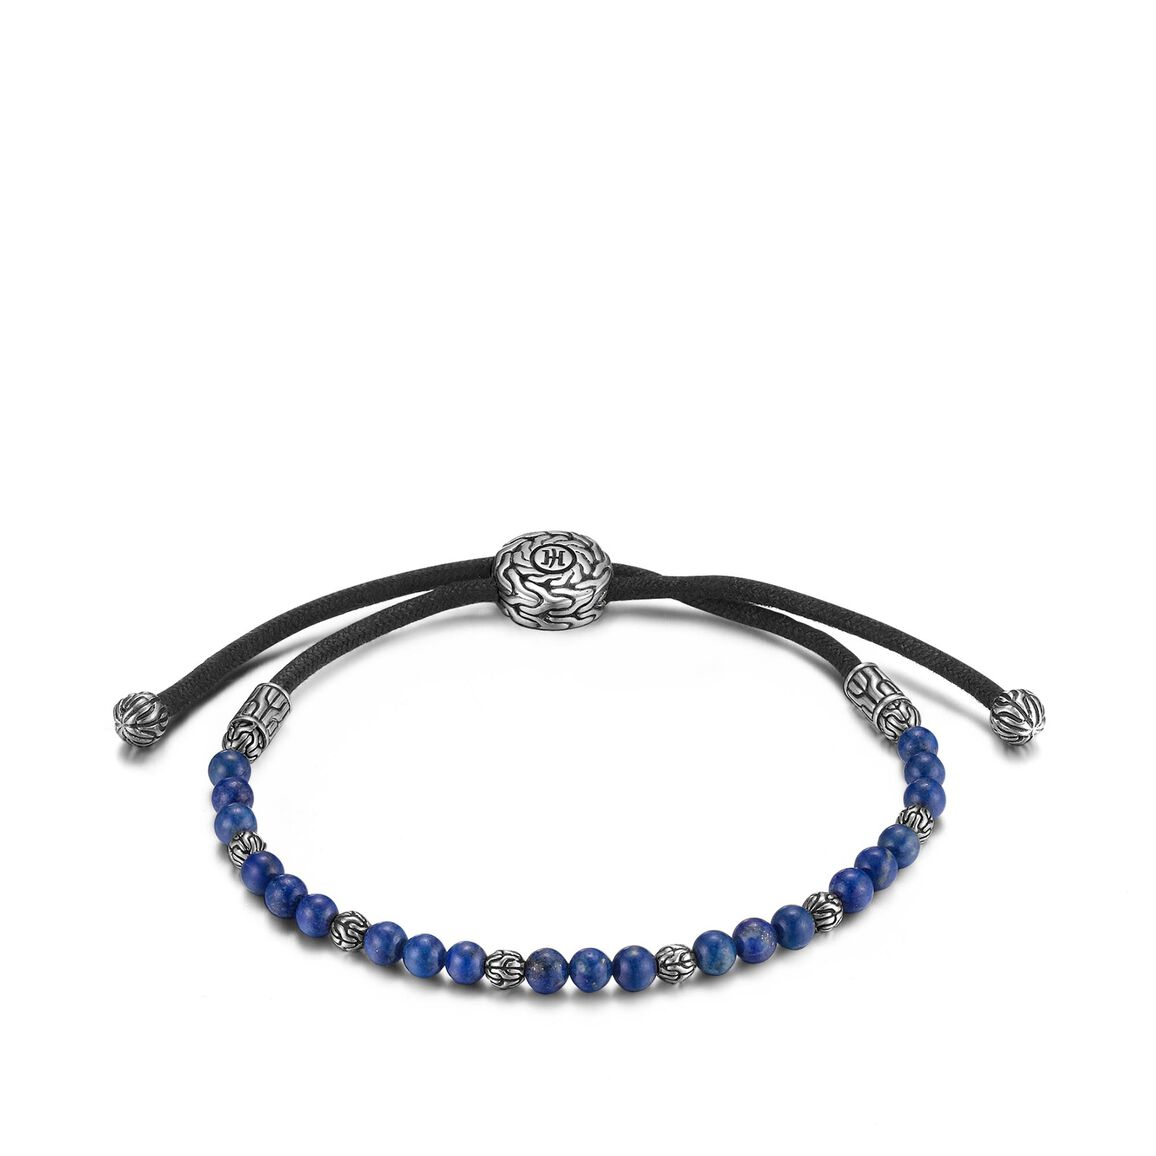 Classic Chain Bead Bracelet in Silver